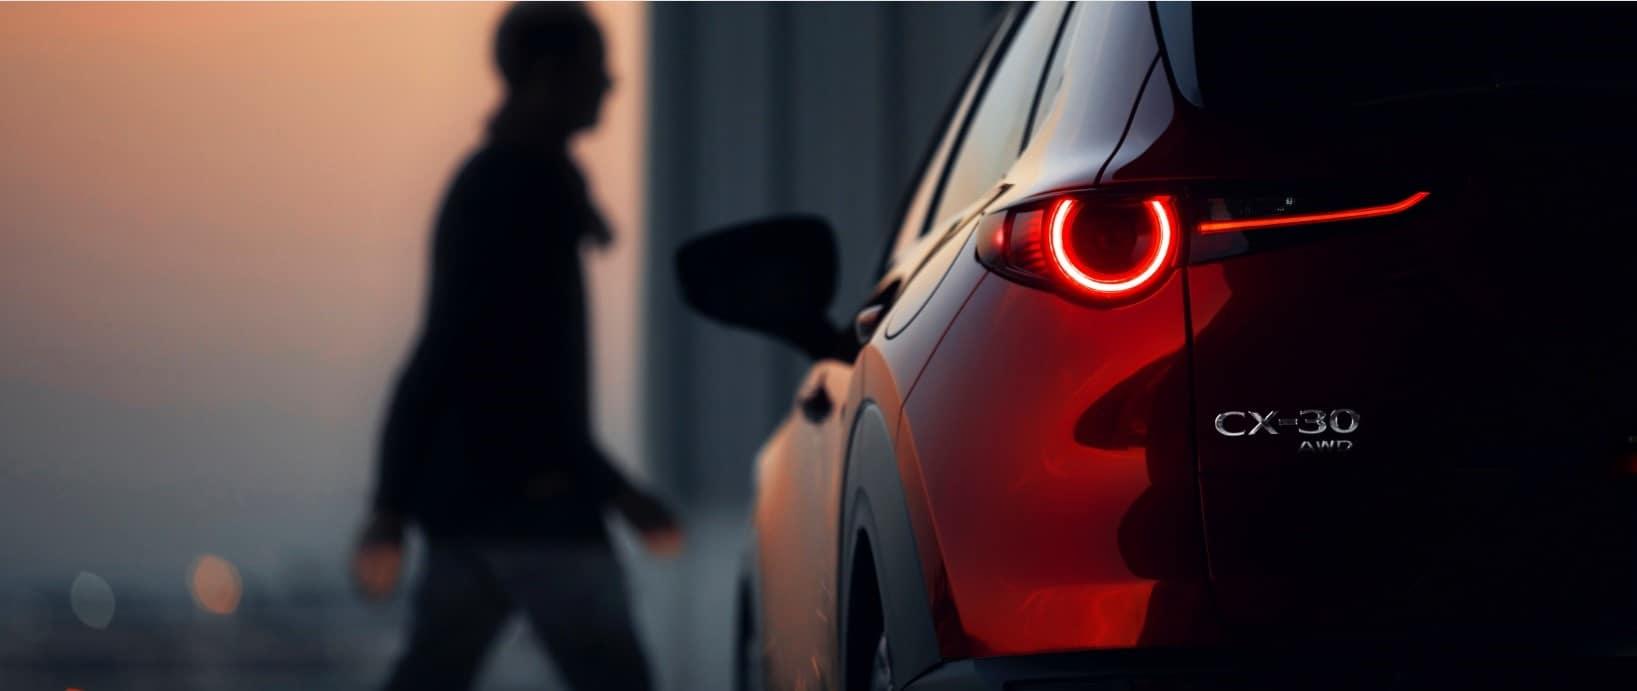 2020 Mazda CX-30 Safety for sale near White Bear Lake, MN